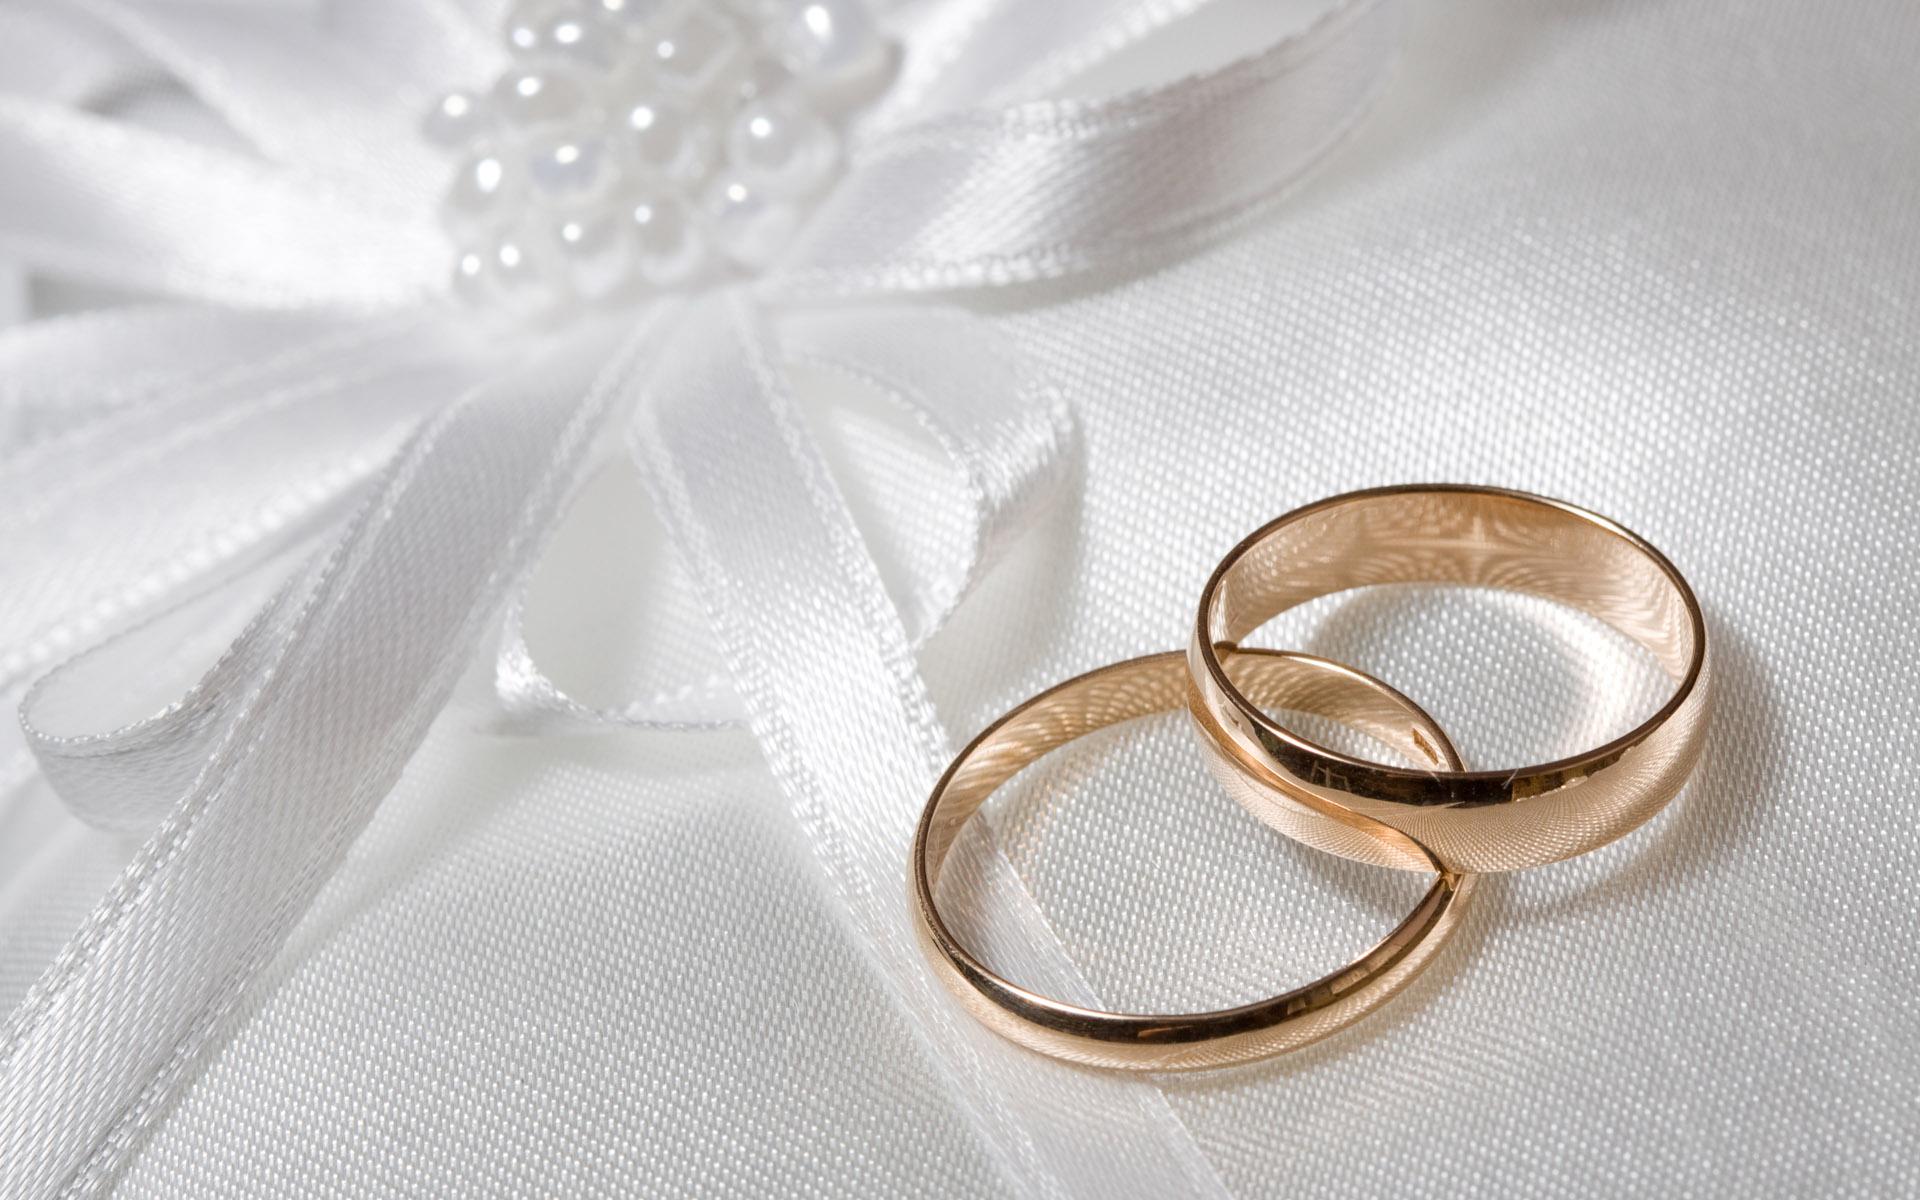 HD Wallpapers Wedding Ring 1920x1200